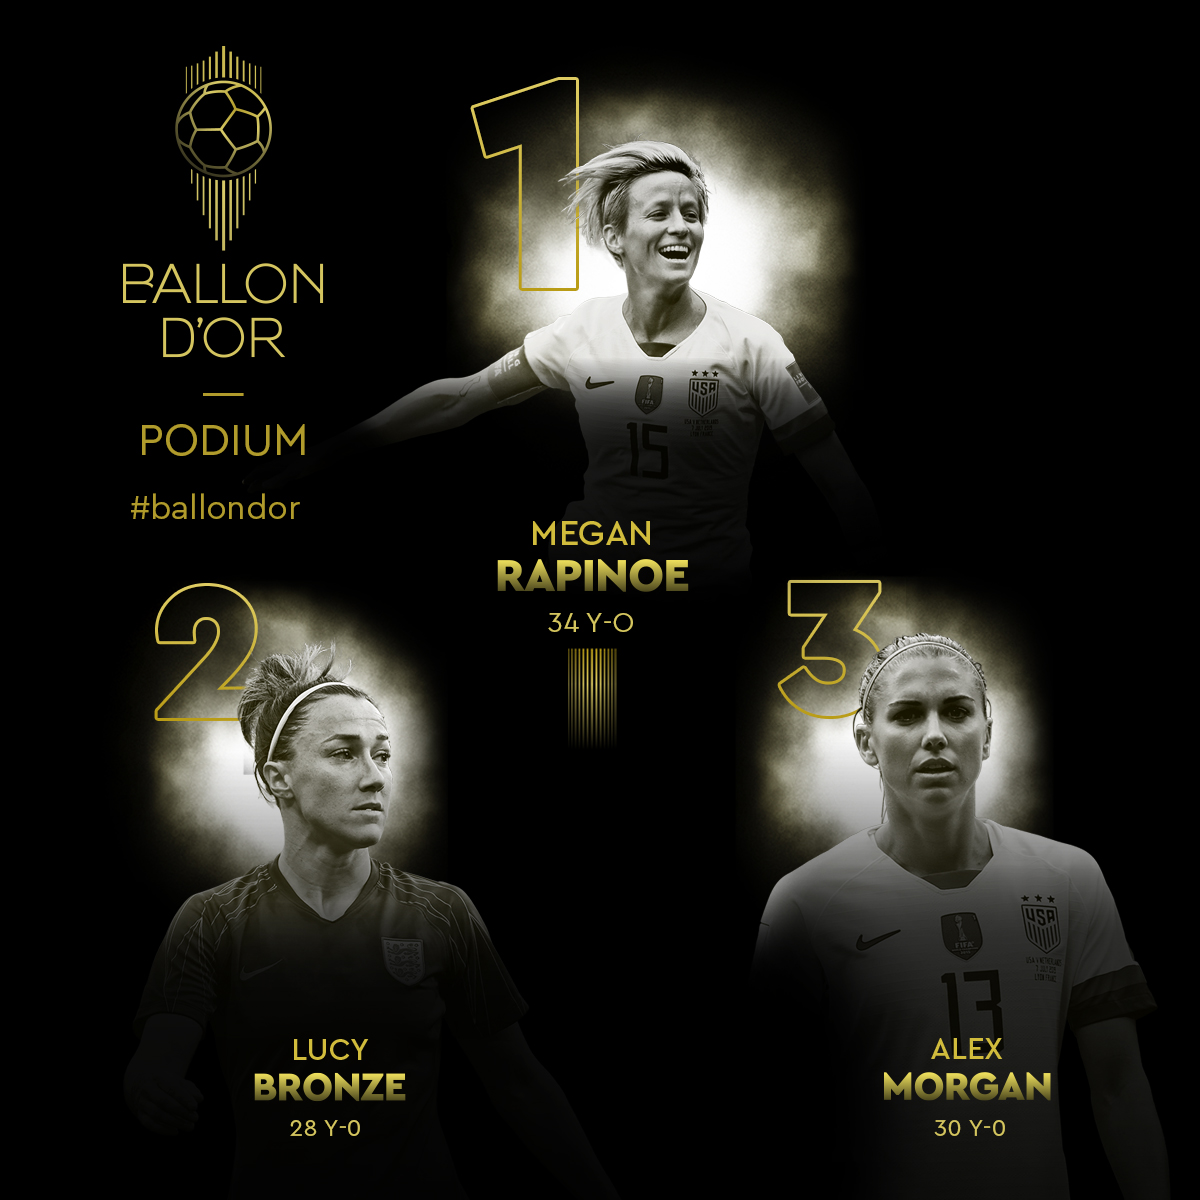 Ballon d'Or - Megan RAPINOE obtient le deuxième Ballon d'Or féminin